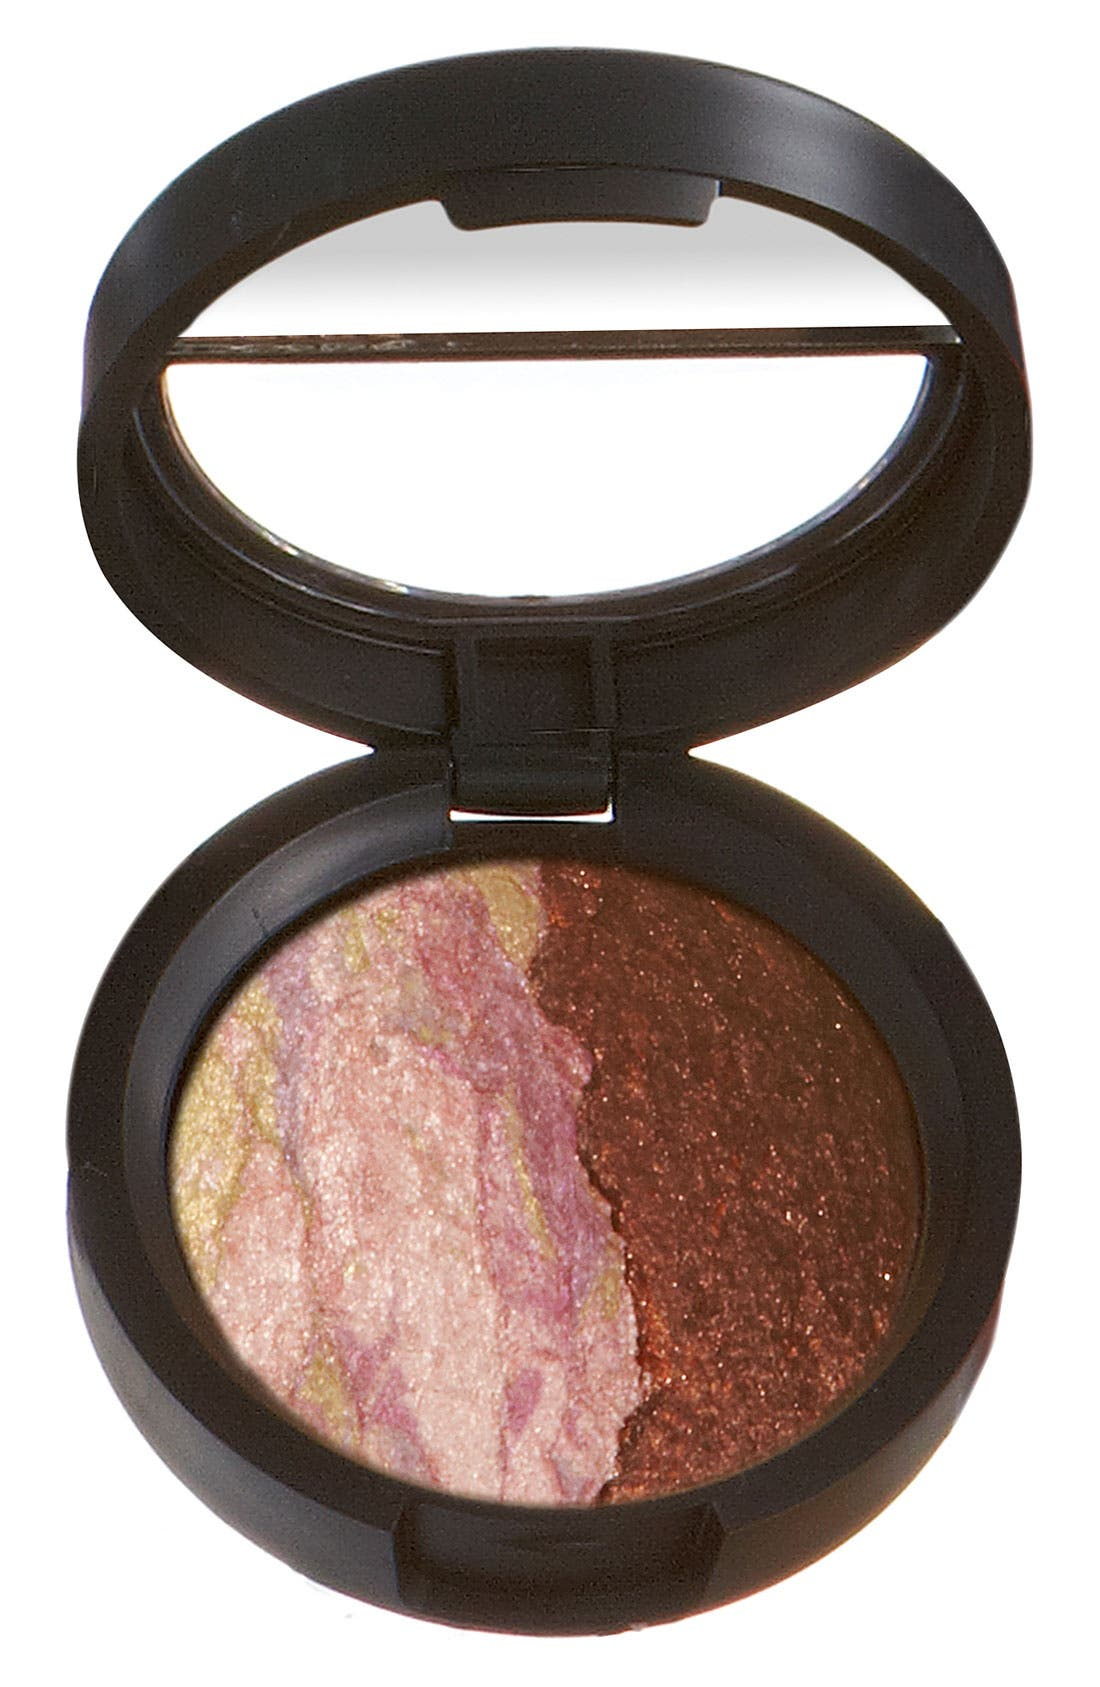 Laura Geller Beauty Baked Eyeshadow Duo